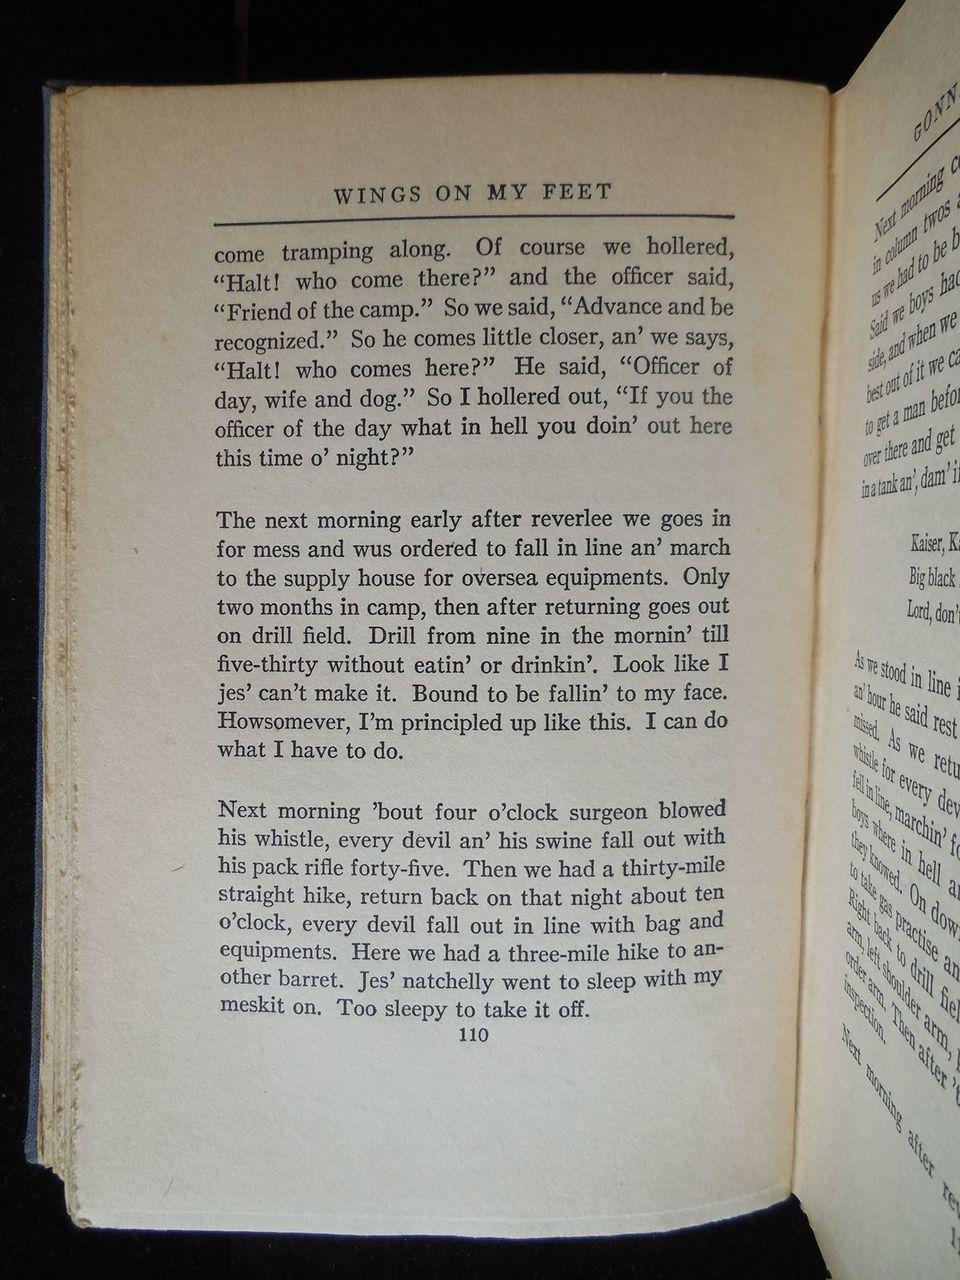 WINGS ON MY FEET, BLACK ULYSSES Howard W Odum 1929 SIGNED 1st Ed Black Americana